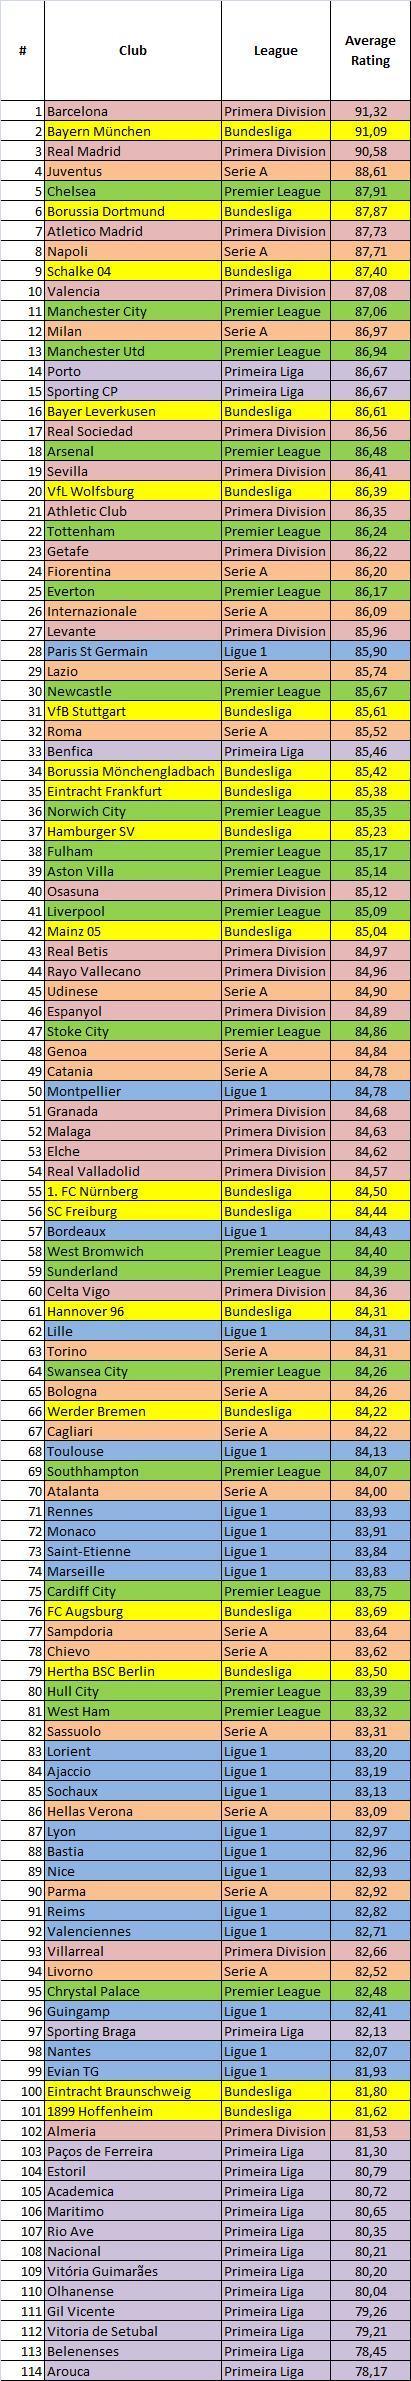 ranking_average_ratinbvut3.jpg